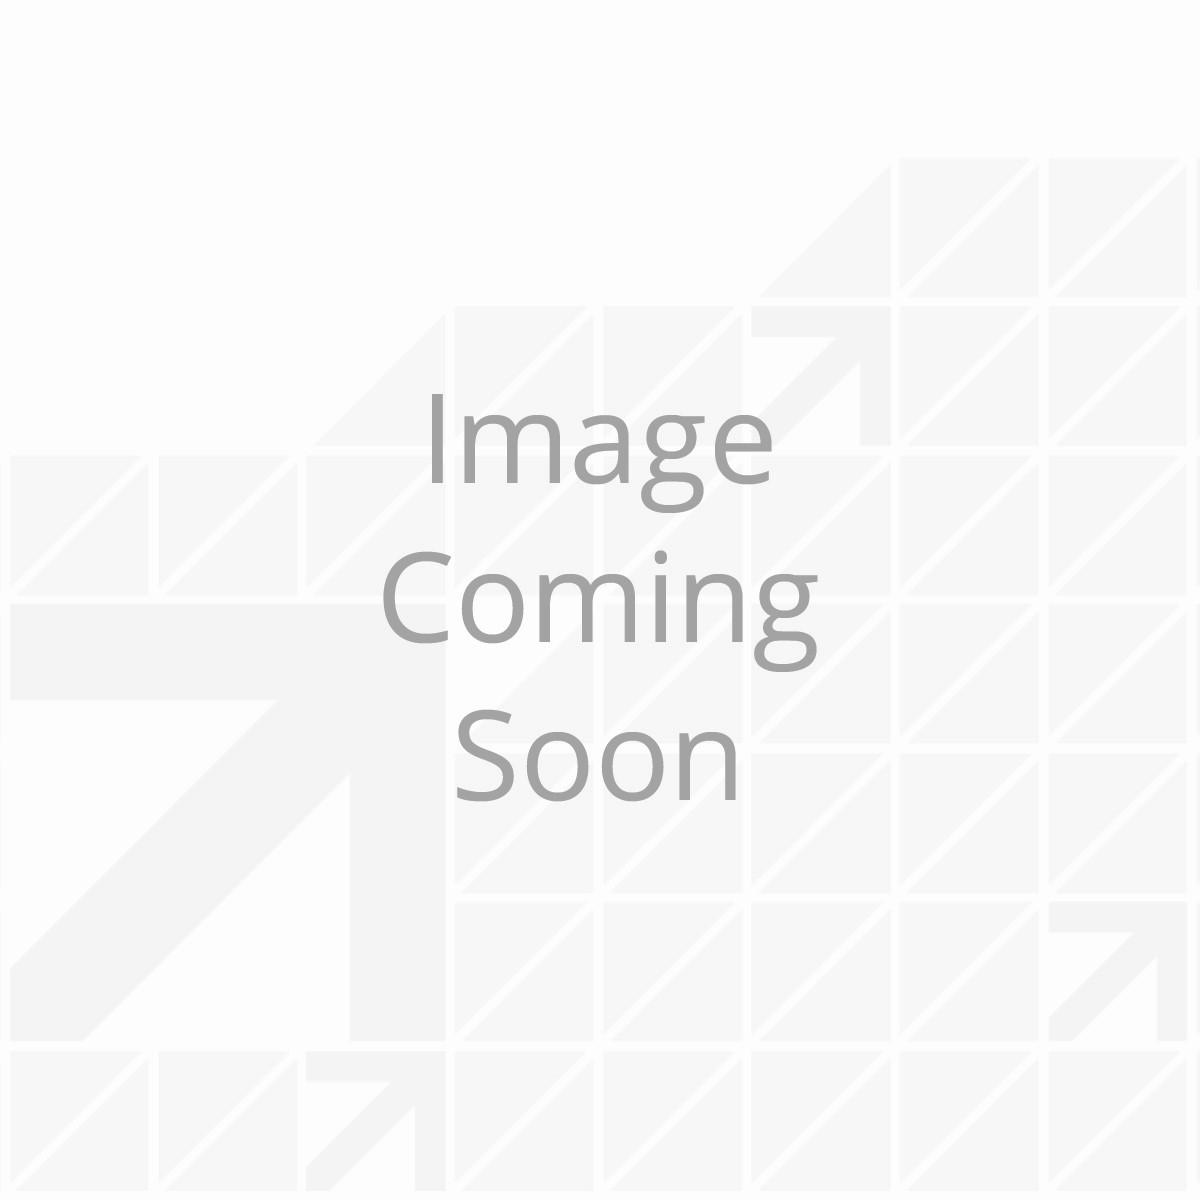 LIT Portable Bluetooth Speaker Wireless Charging Dock